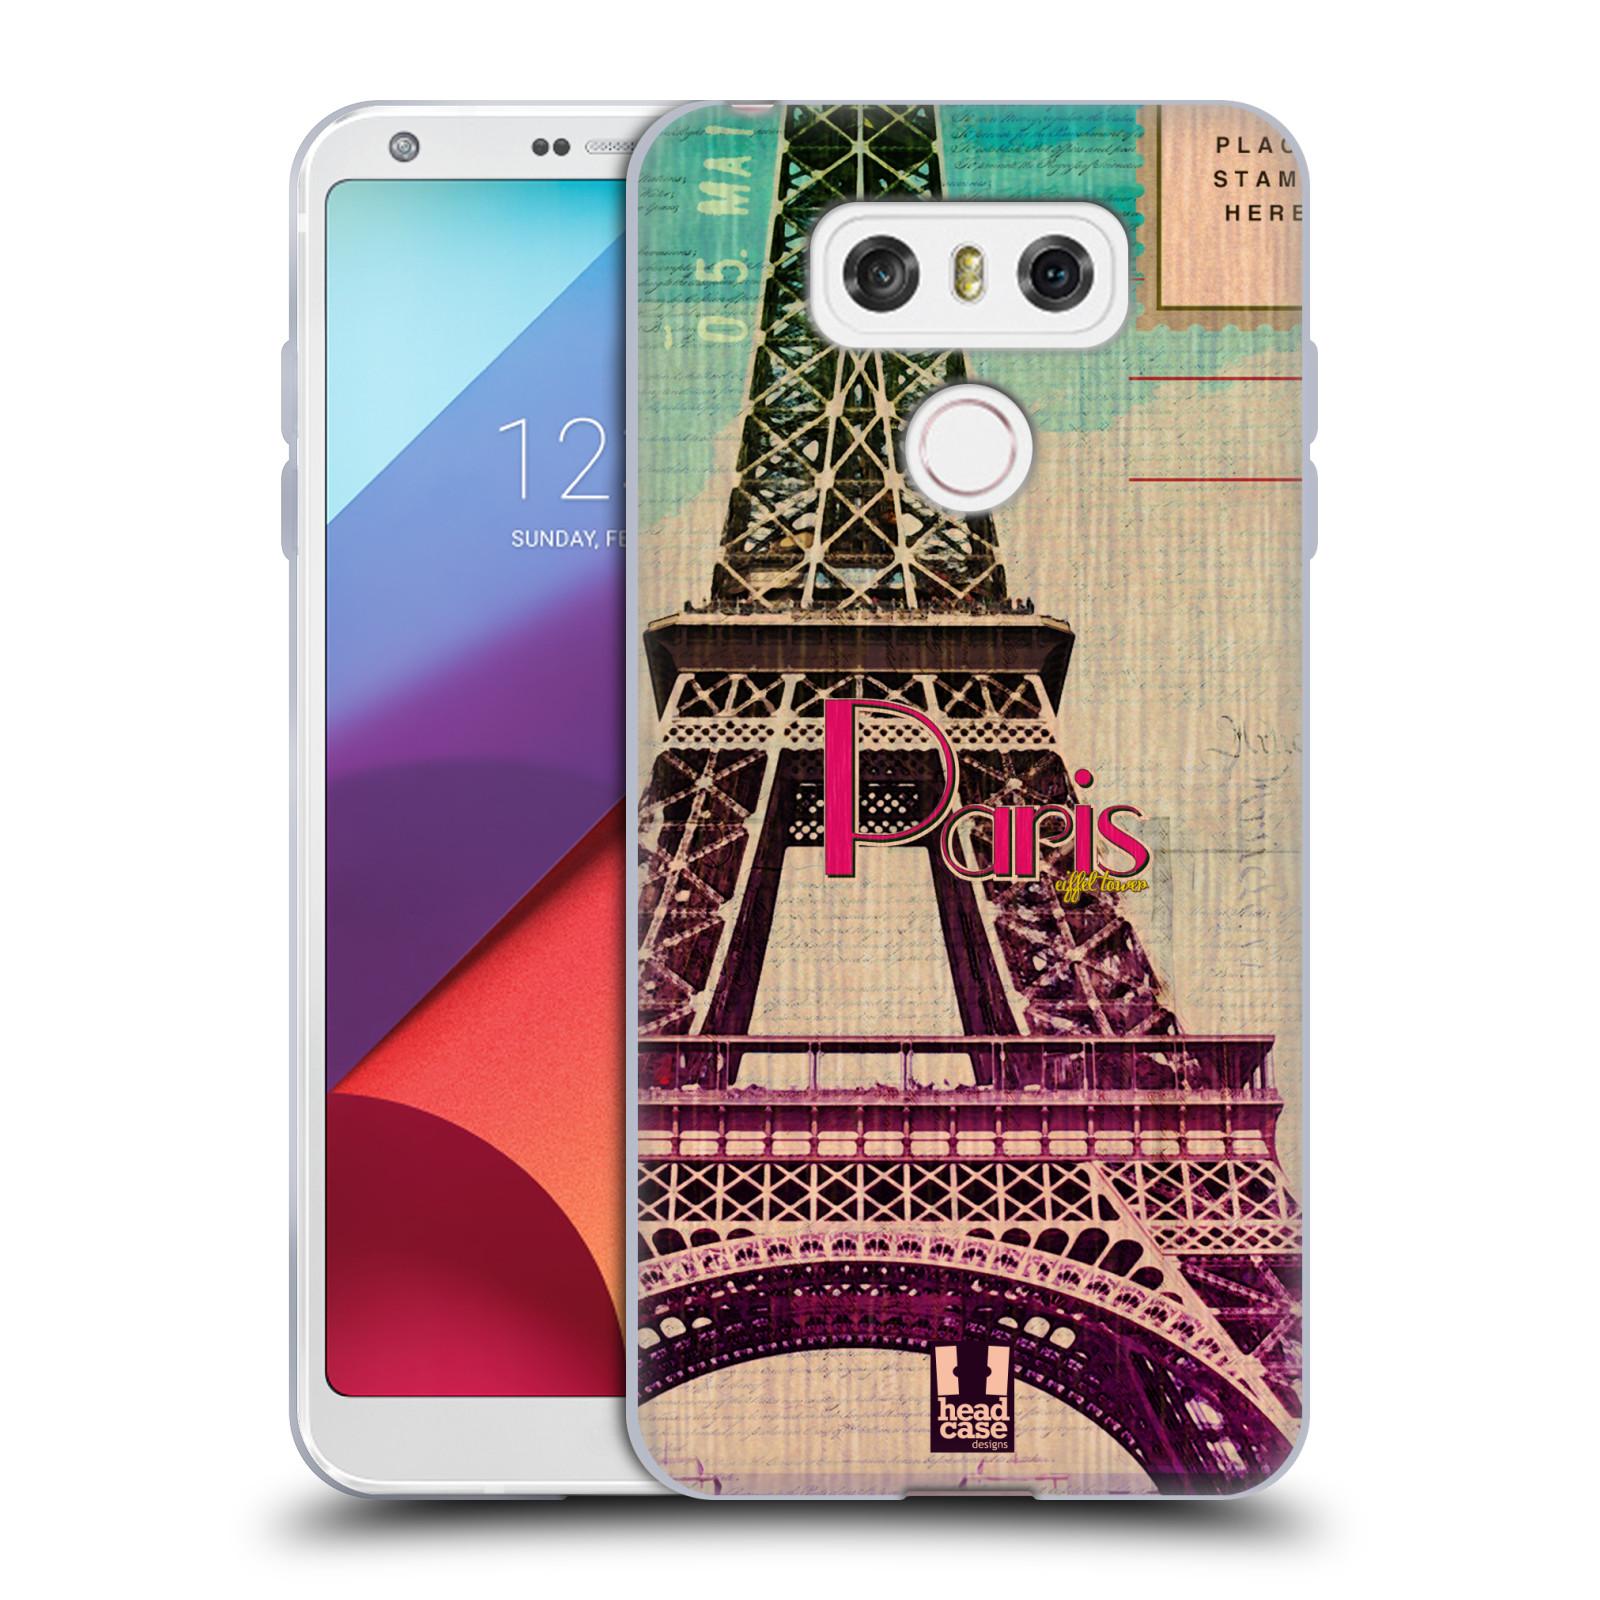 Silikonové pouzdro na mobil LG G6 - Head Case PARIS VINTAGE (Silikonový kryt či obal na mobilní telefon LG G6 H870 / LG G6 Dual SIM H870DS)